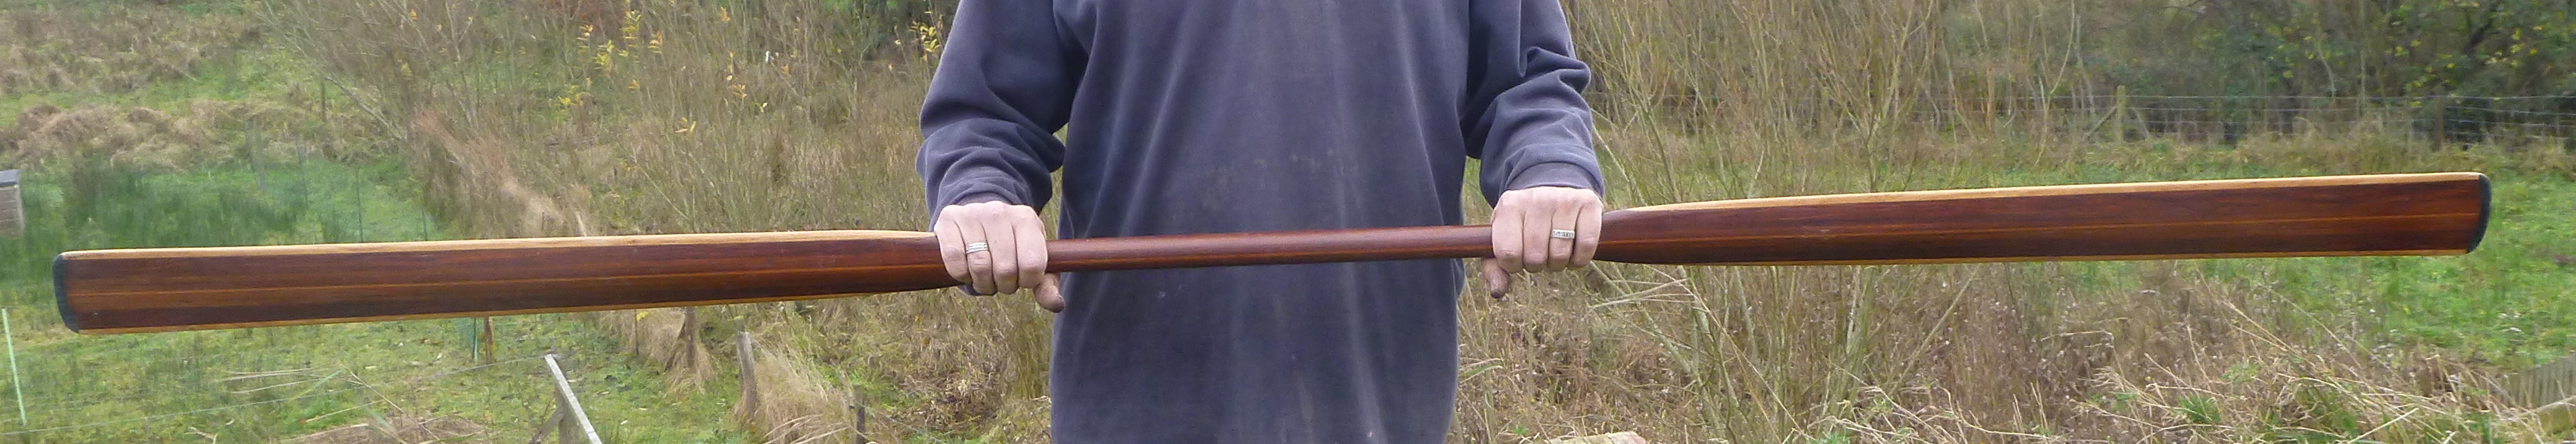 Loom width image